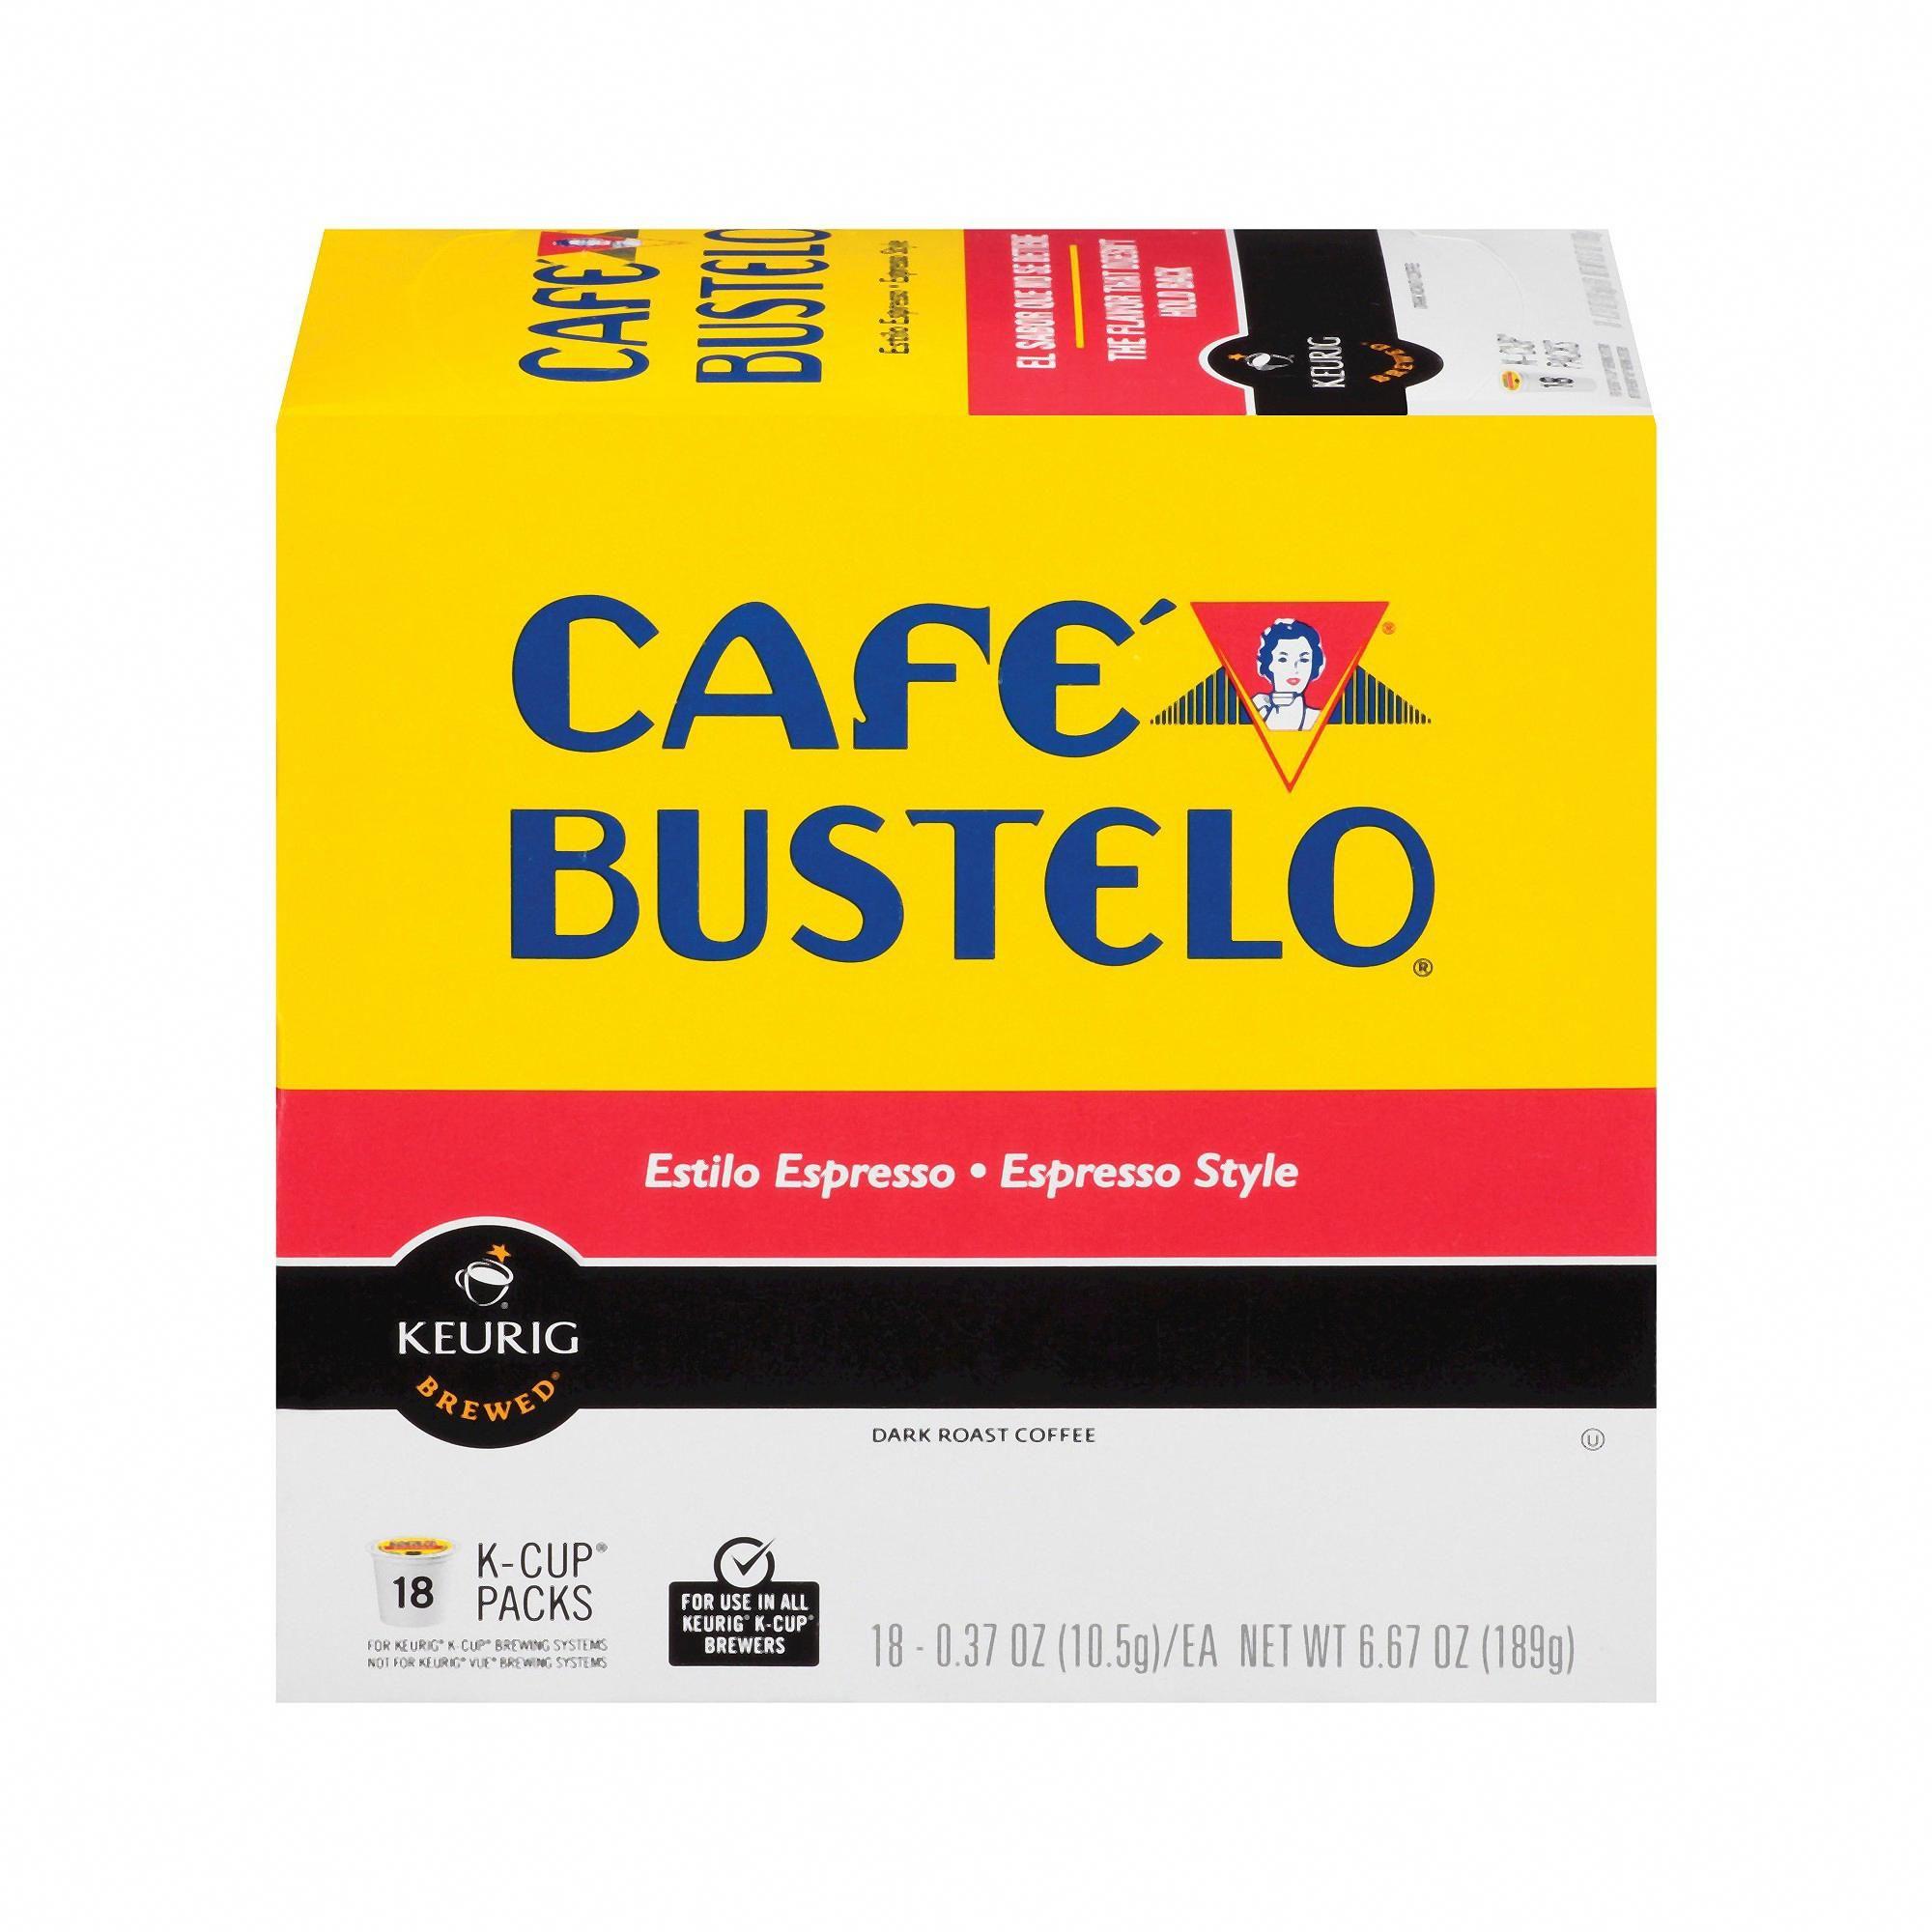 Cafe Bustelo Espresso Dark Roast Coffee KCup Pods